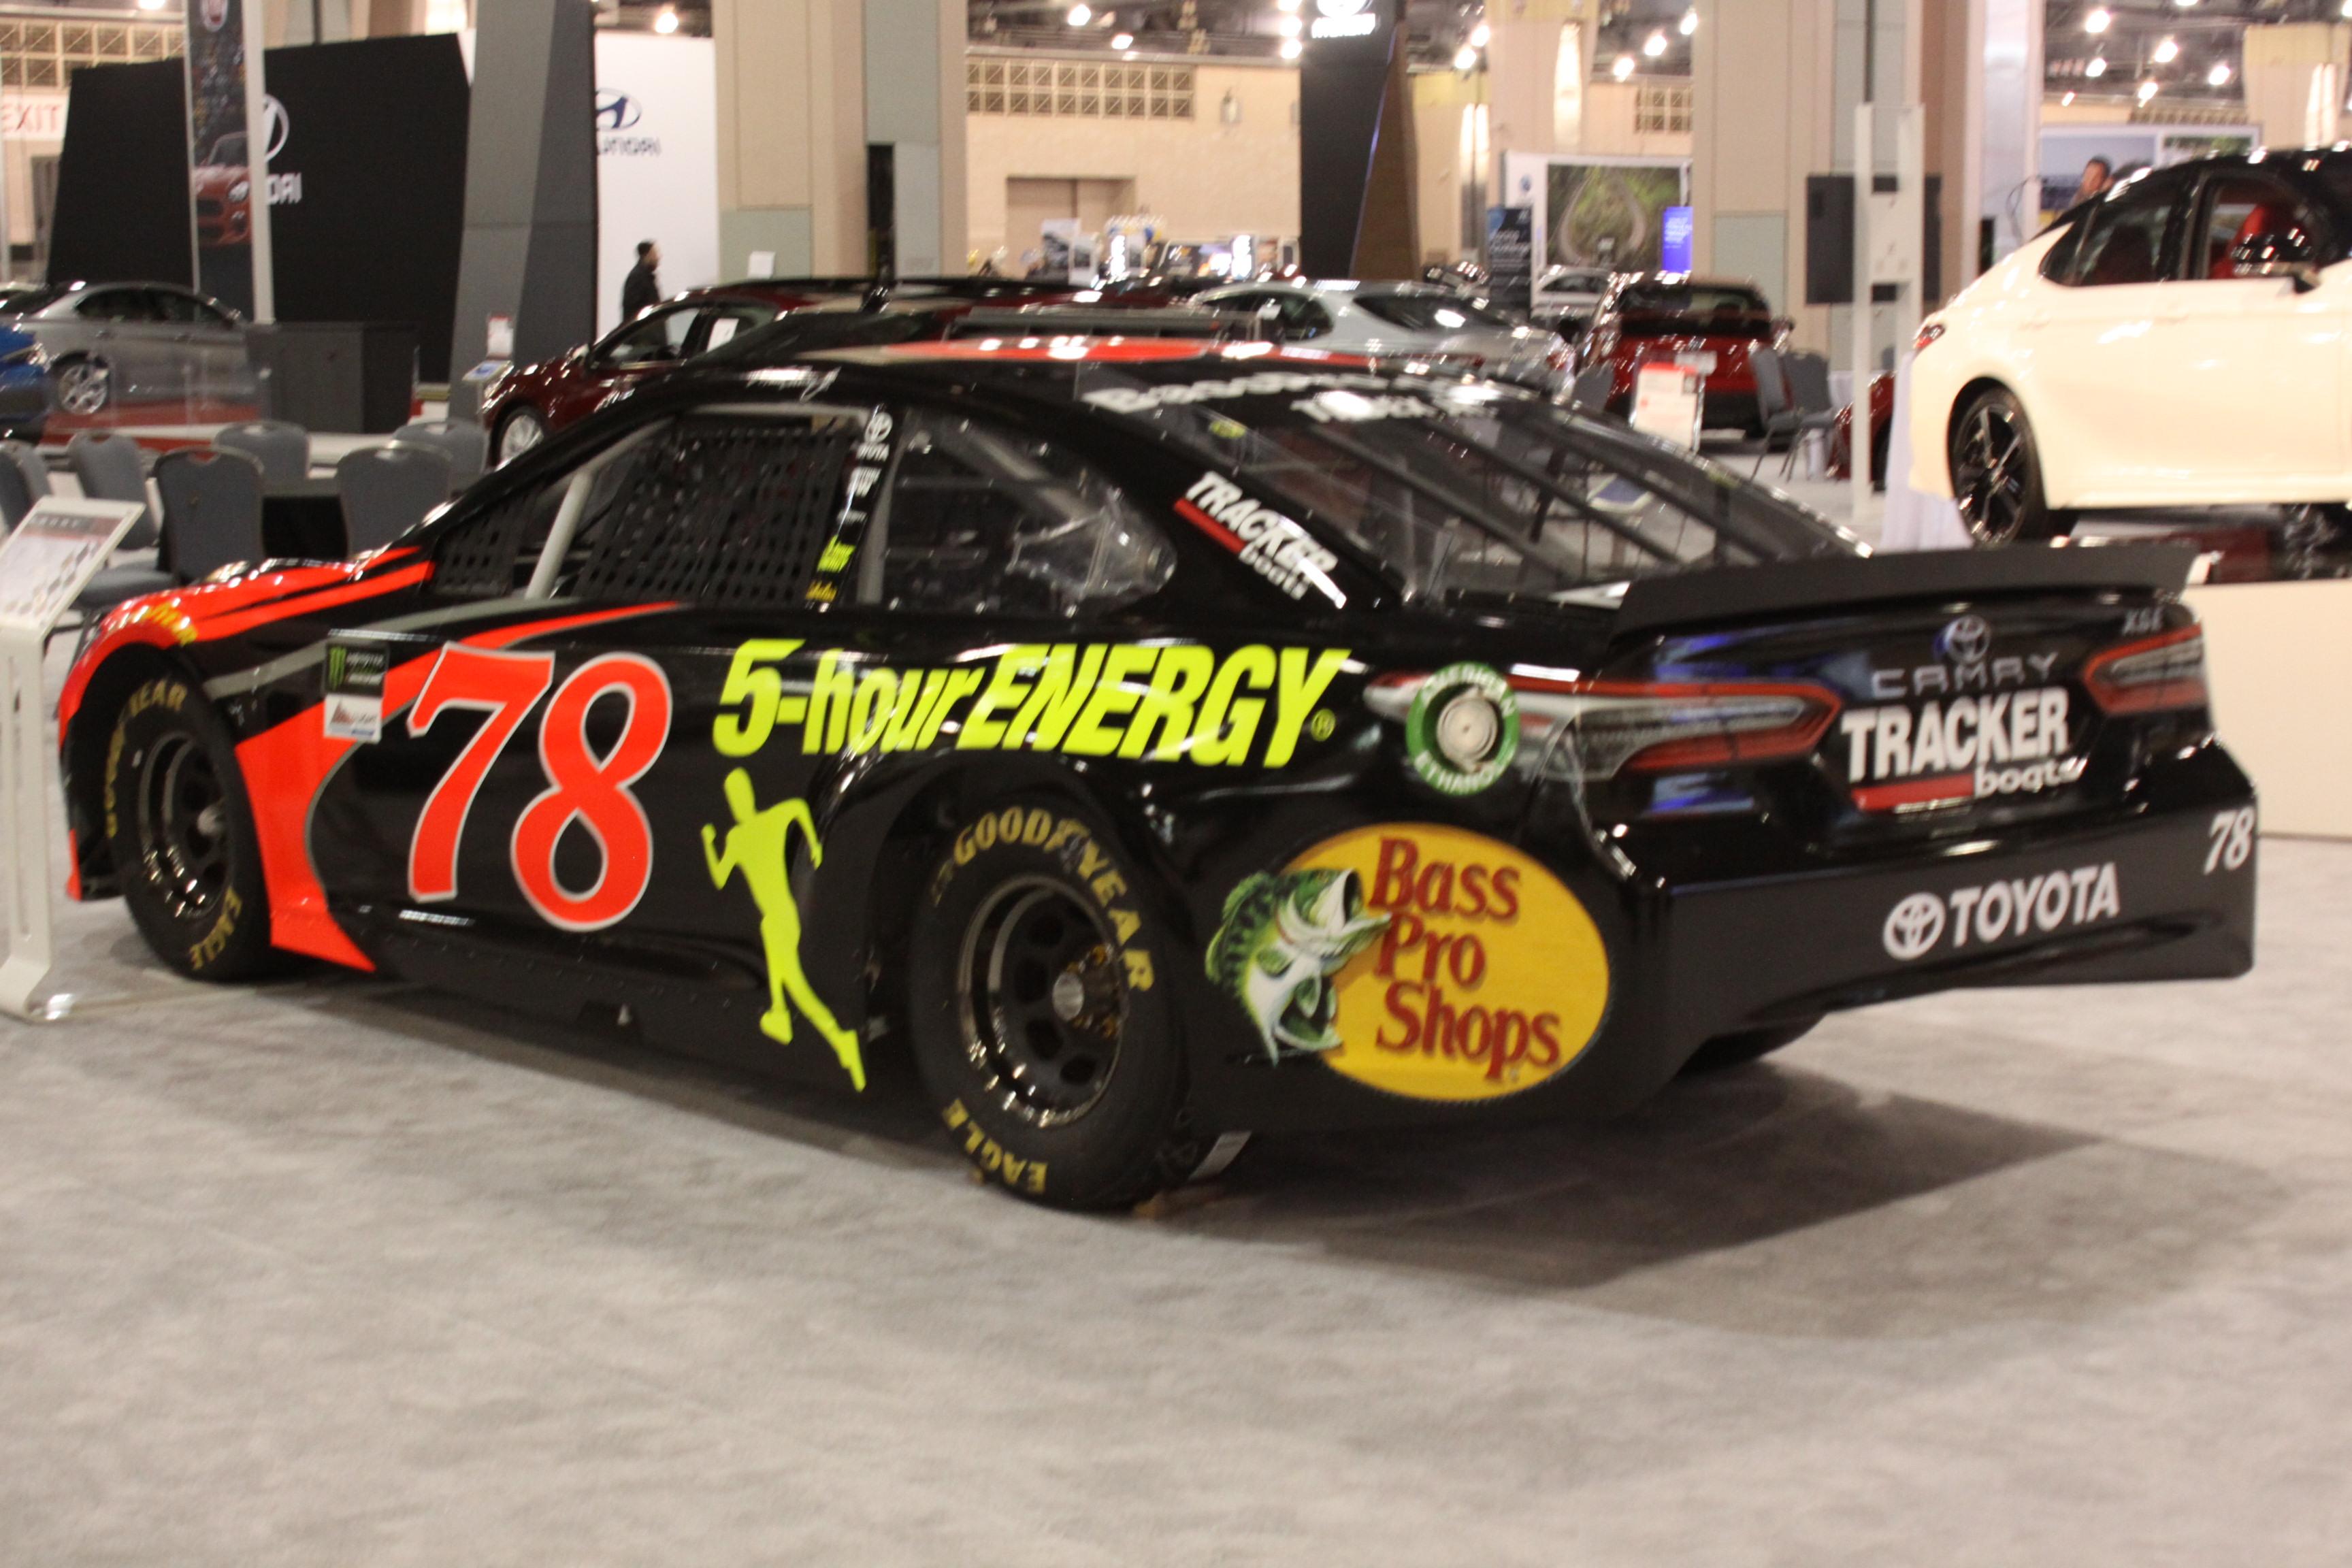 GALLERY Philadelphia Auto Show WBFF - Philadelphia convention center car show